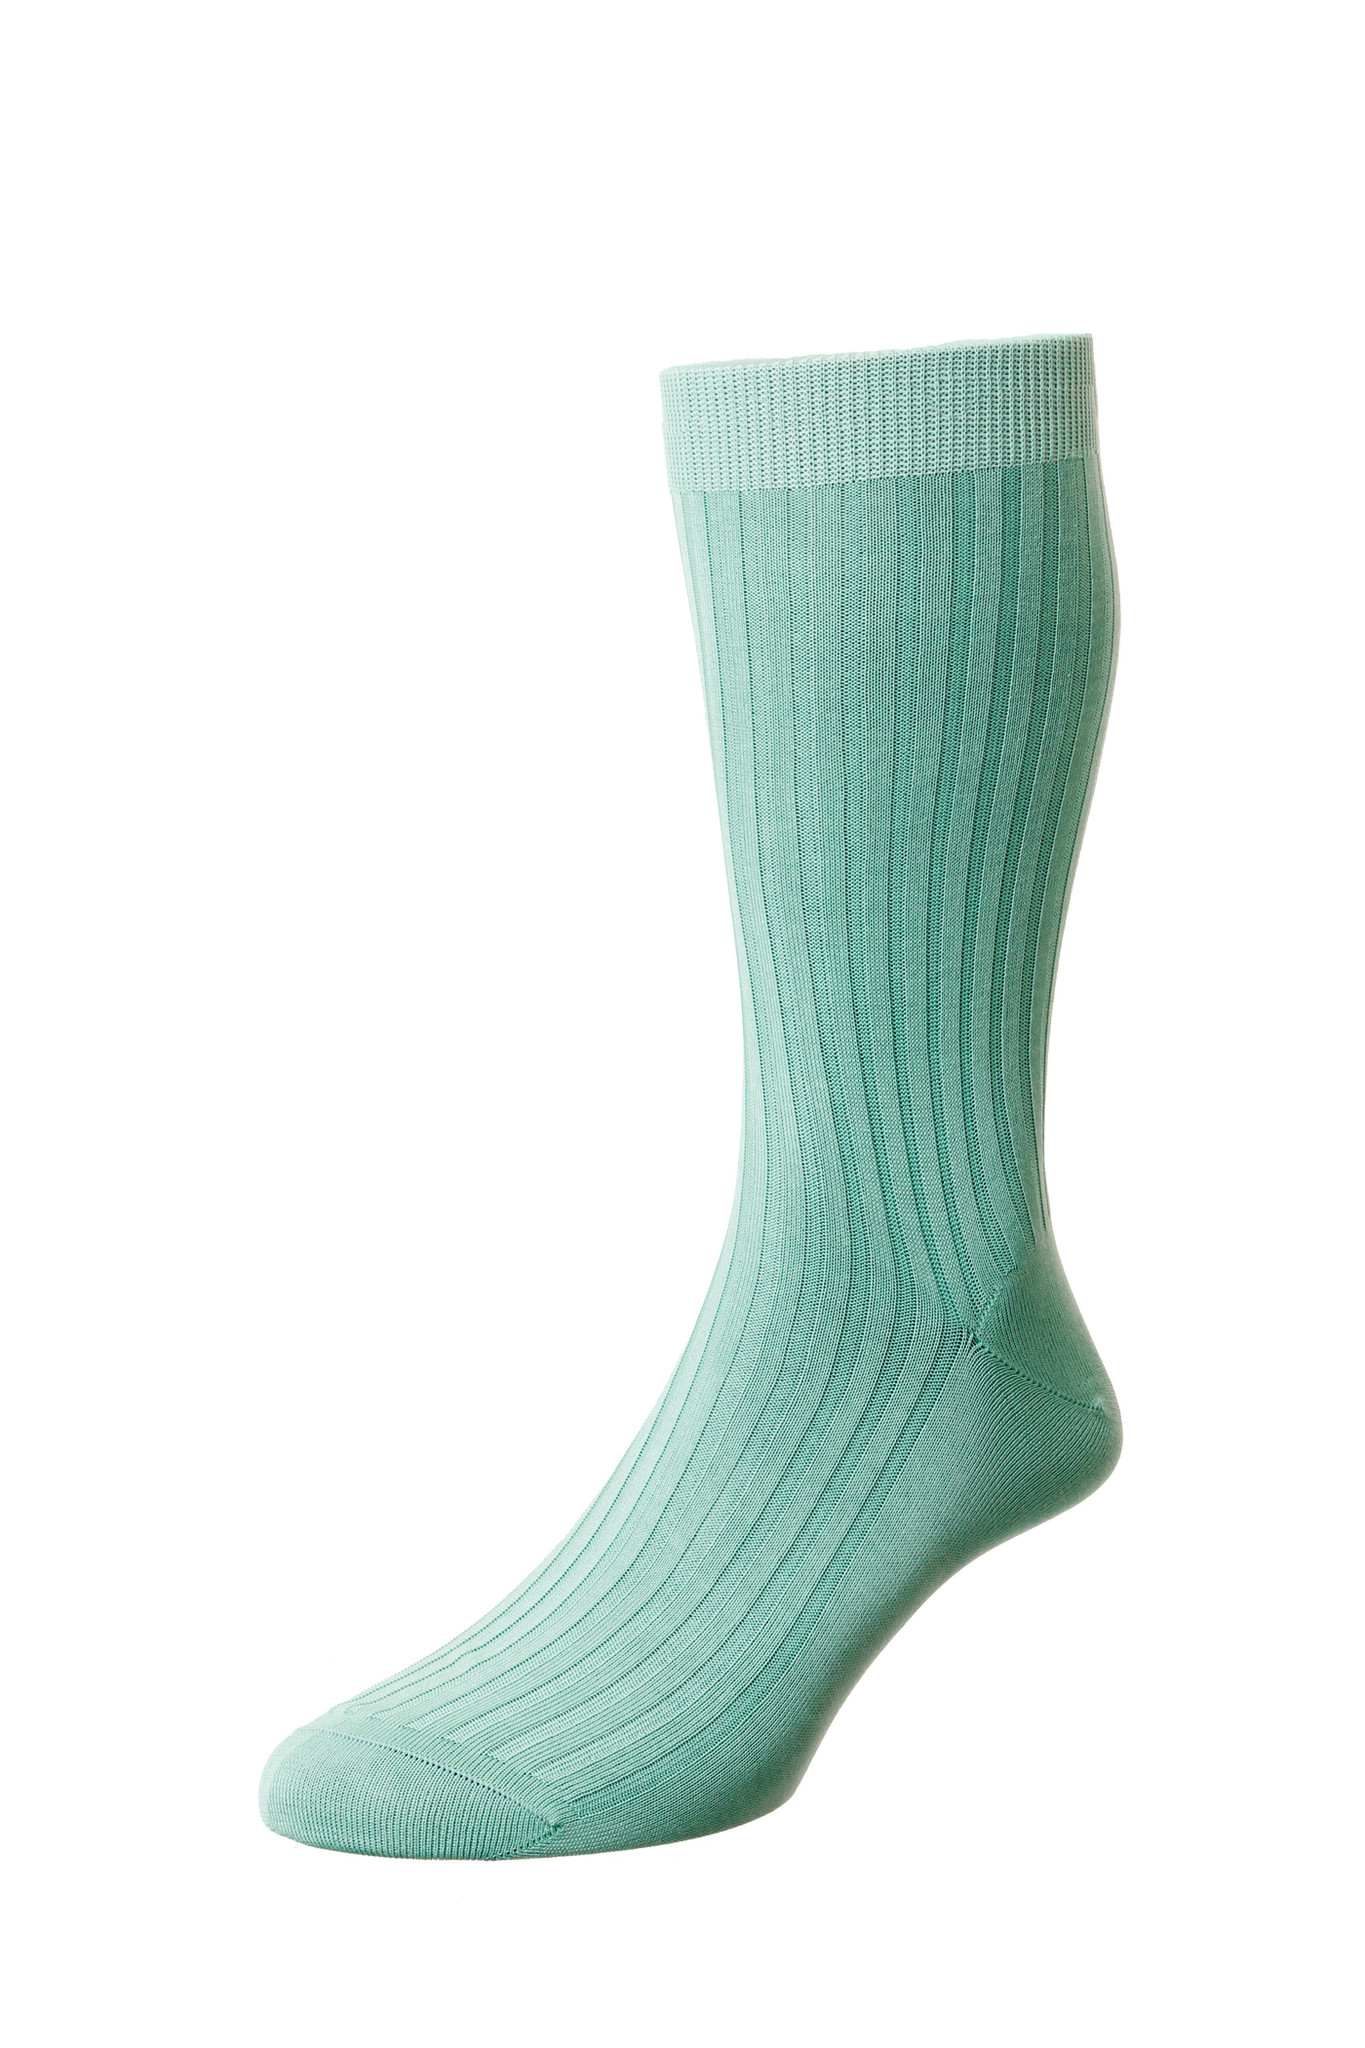 Pantherella 5X3 Rib Mercerised Cotton Socks - Danvers